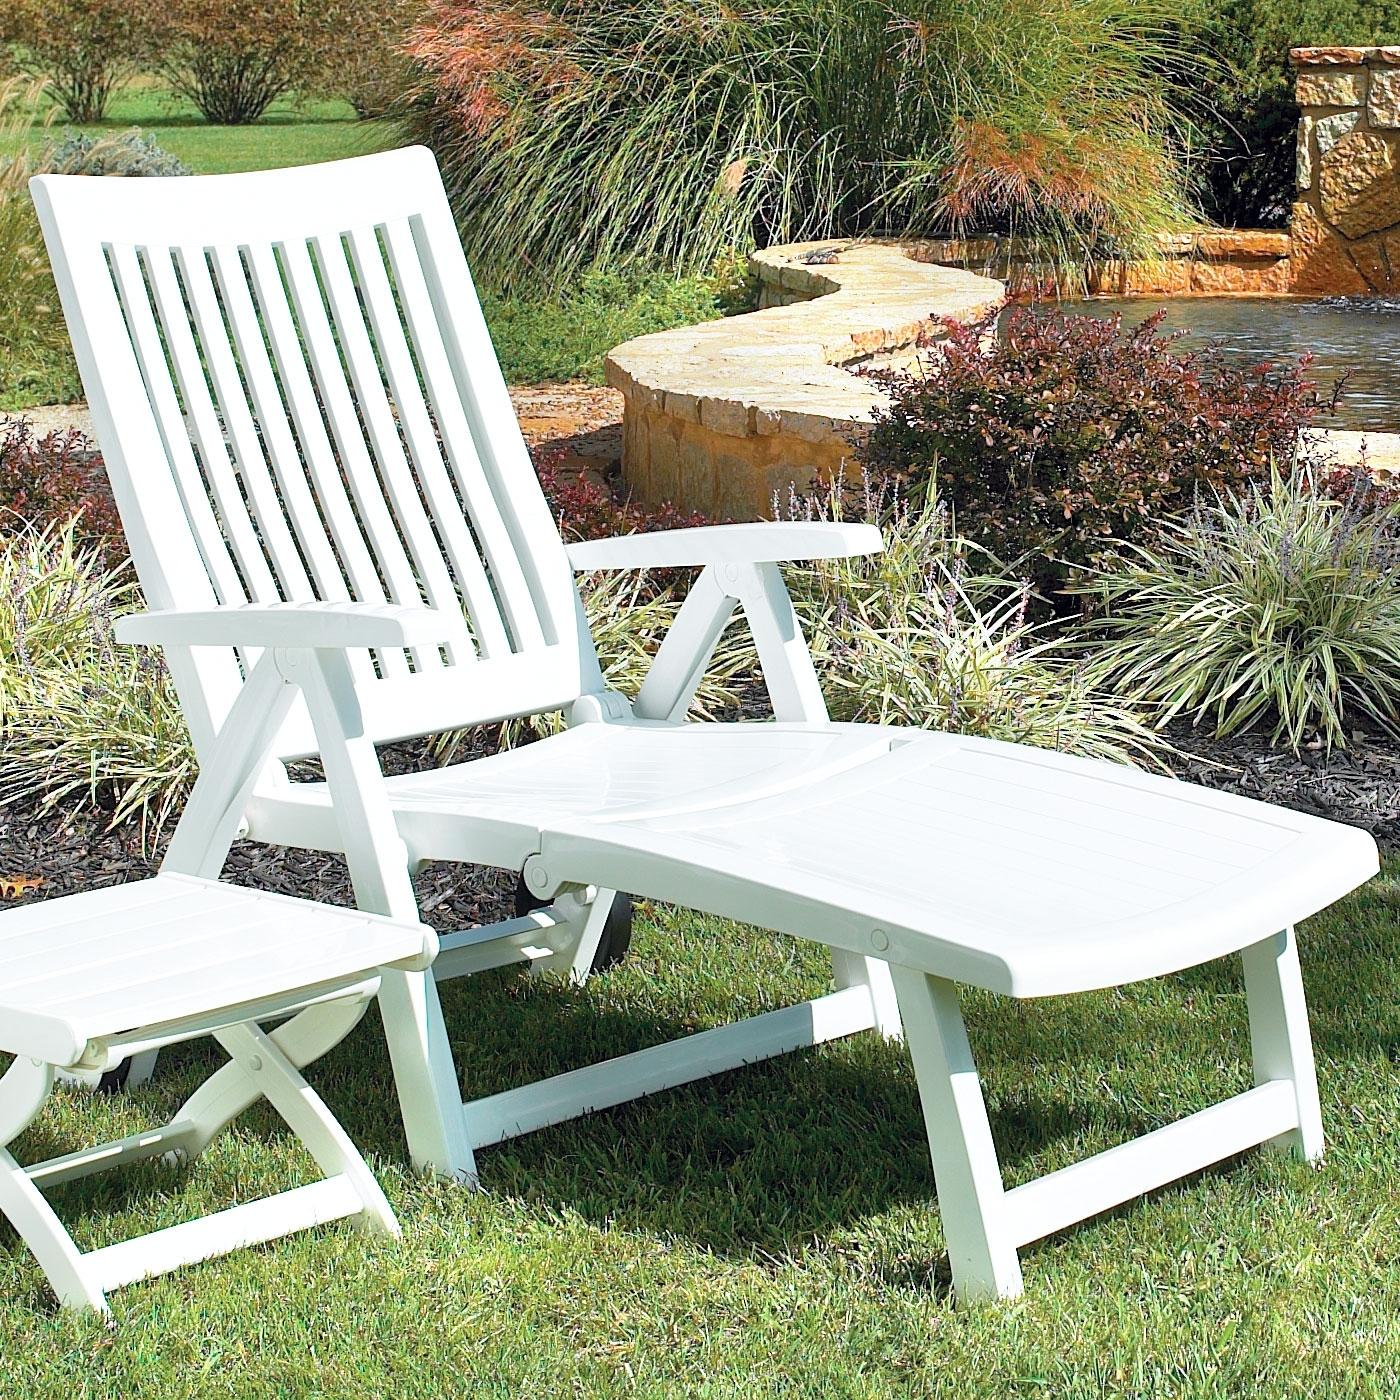 Kettler Chaise Lounge (Standard) Intended For Fashionable Kettler Chaise Lounge Chairs (View 10 of 15)